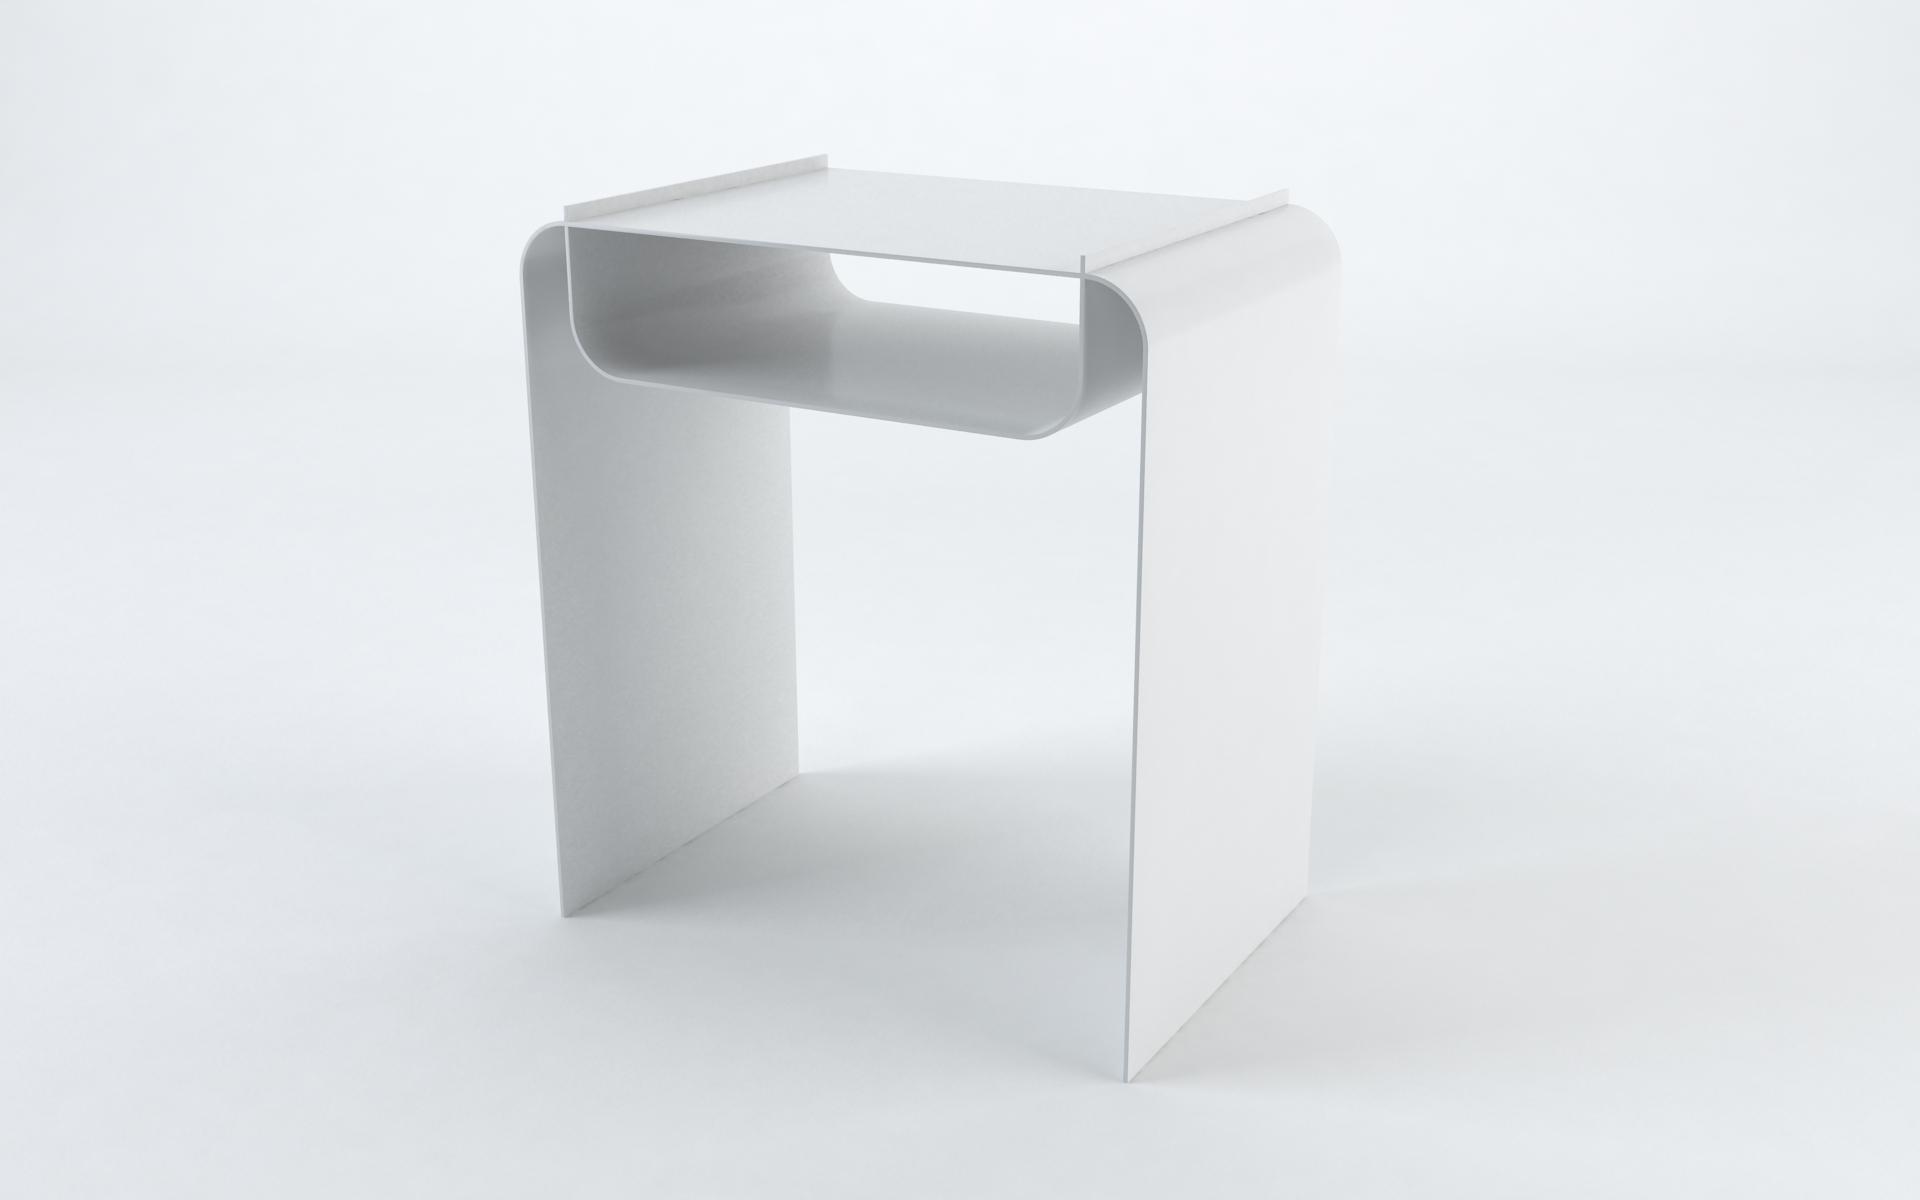 Table de chevet Benjamin Rousse design studio1